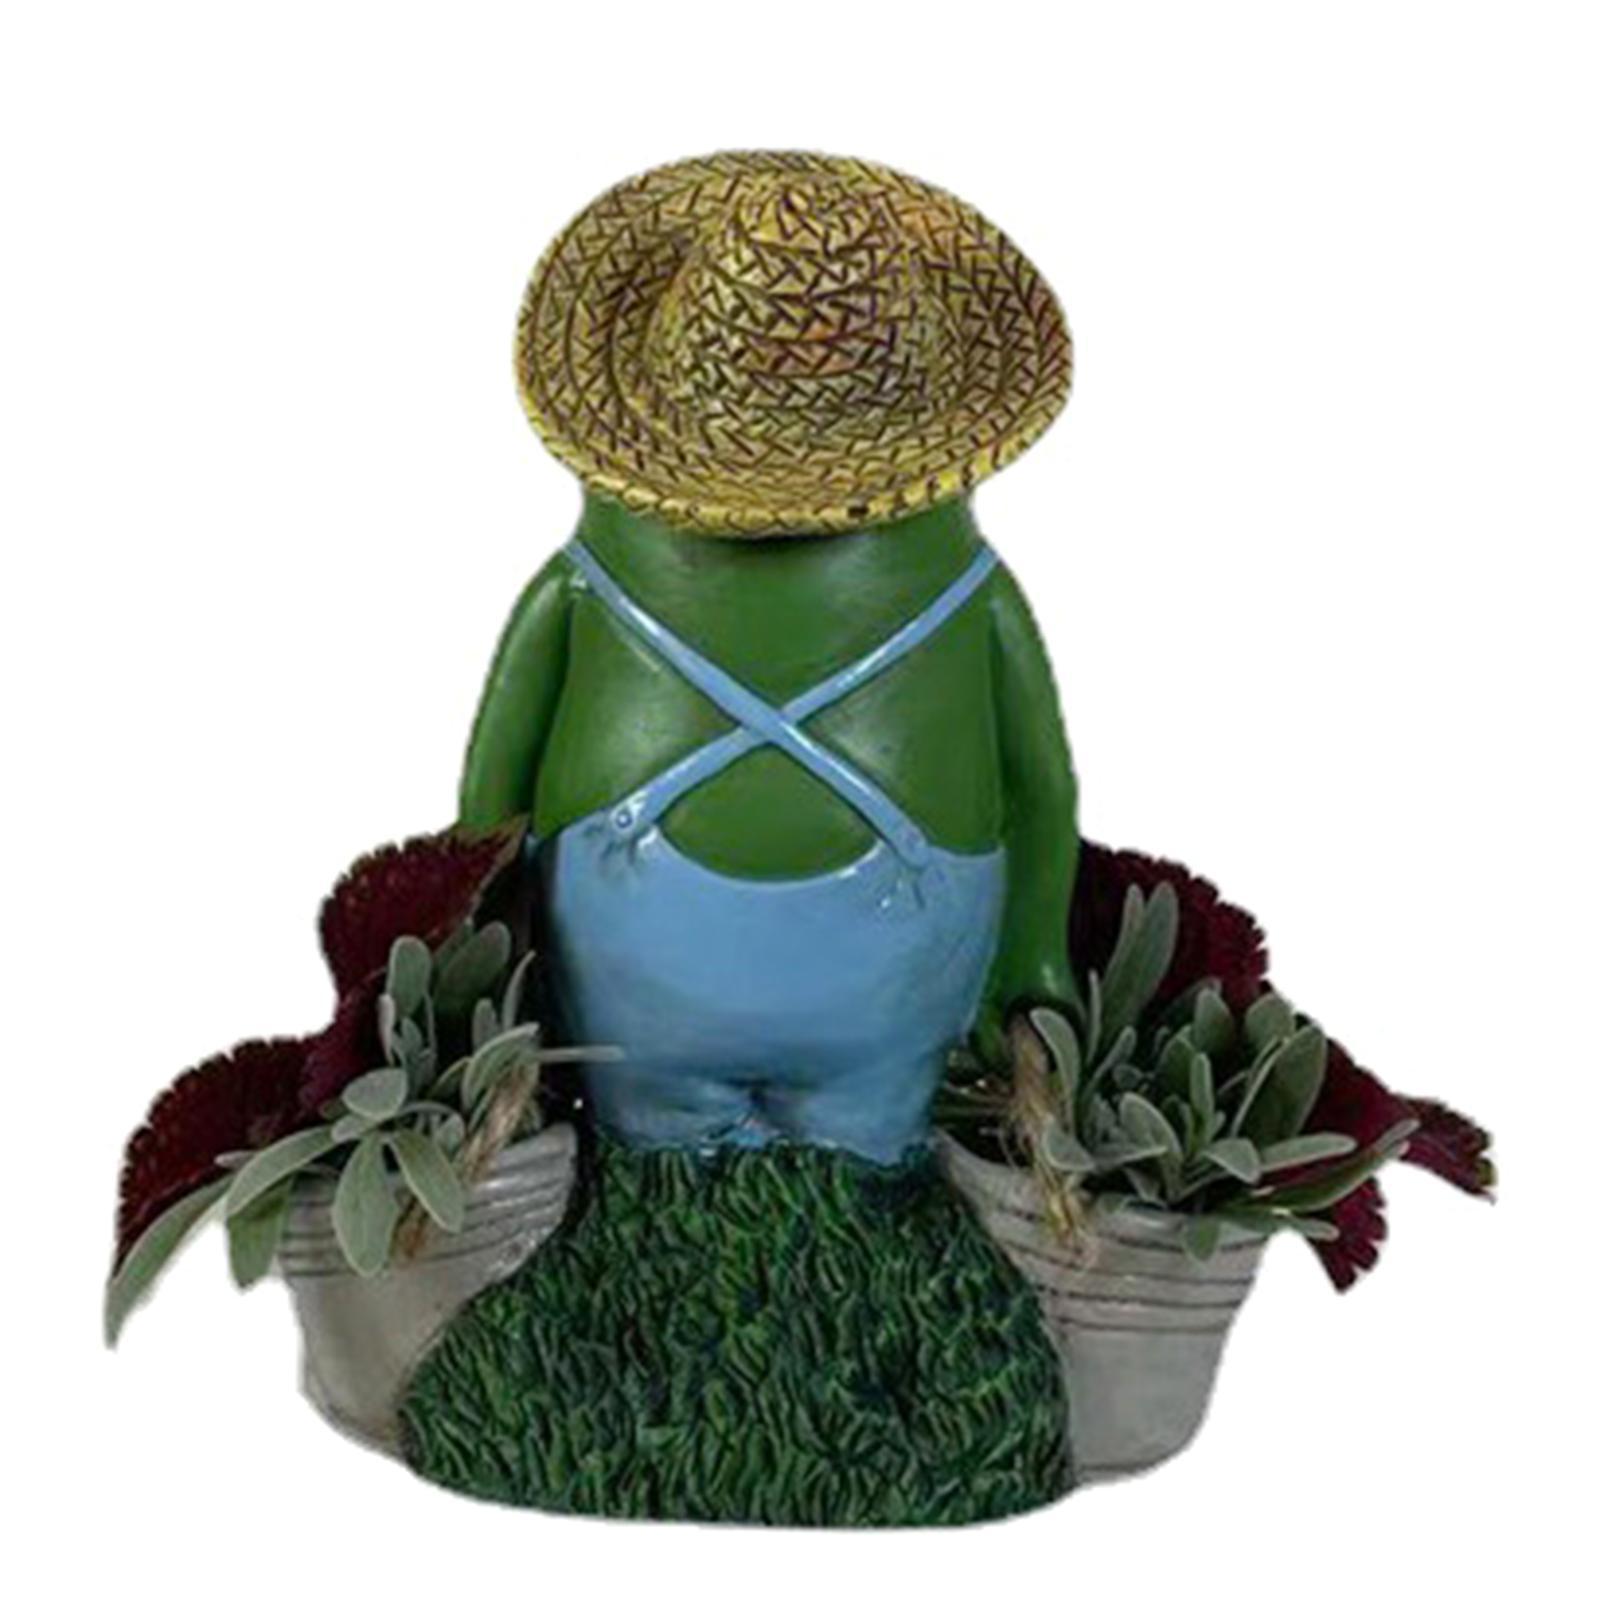 Indexbild 7 - Blumentopf Kreative Tier Sukkulente Topf Kaktus Topf Pflanzen Topf